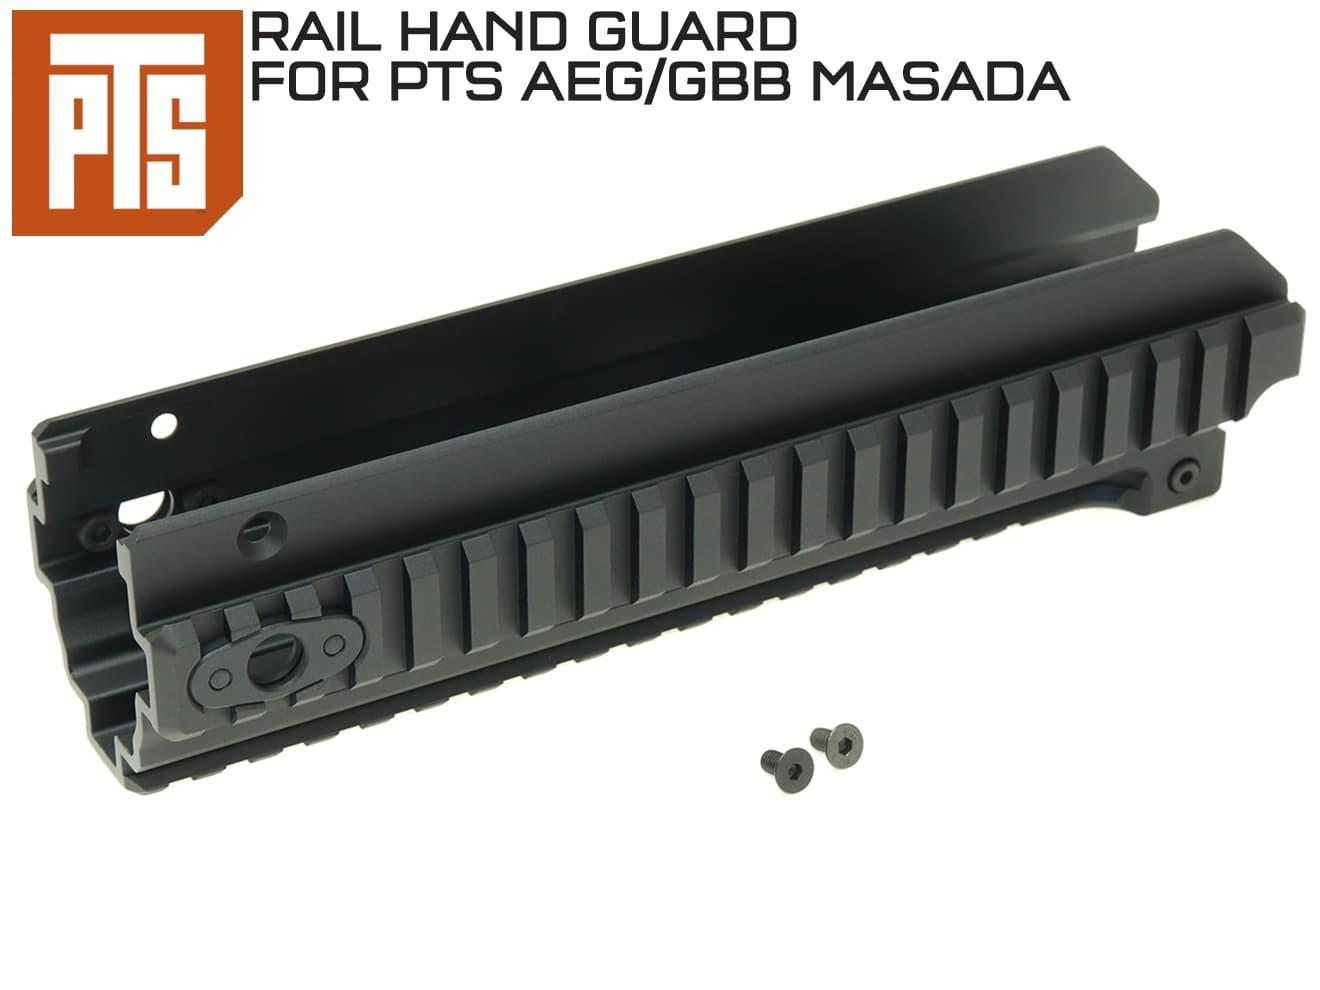 PTS MASADA レールハンドガードキット◆PTS AEG/GBB MASADAシリーズ対応 MASADA レール化に 20mmレイル RAS RIS ドレスアップ